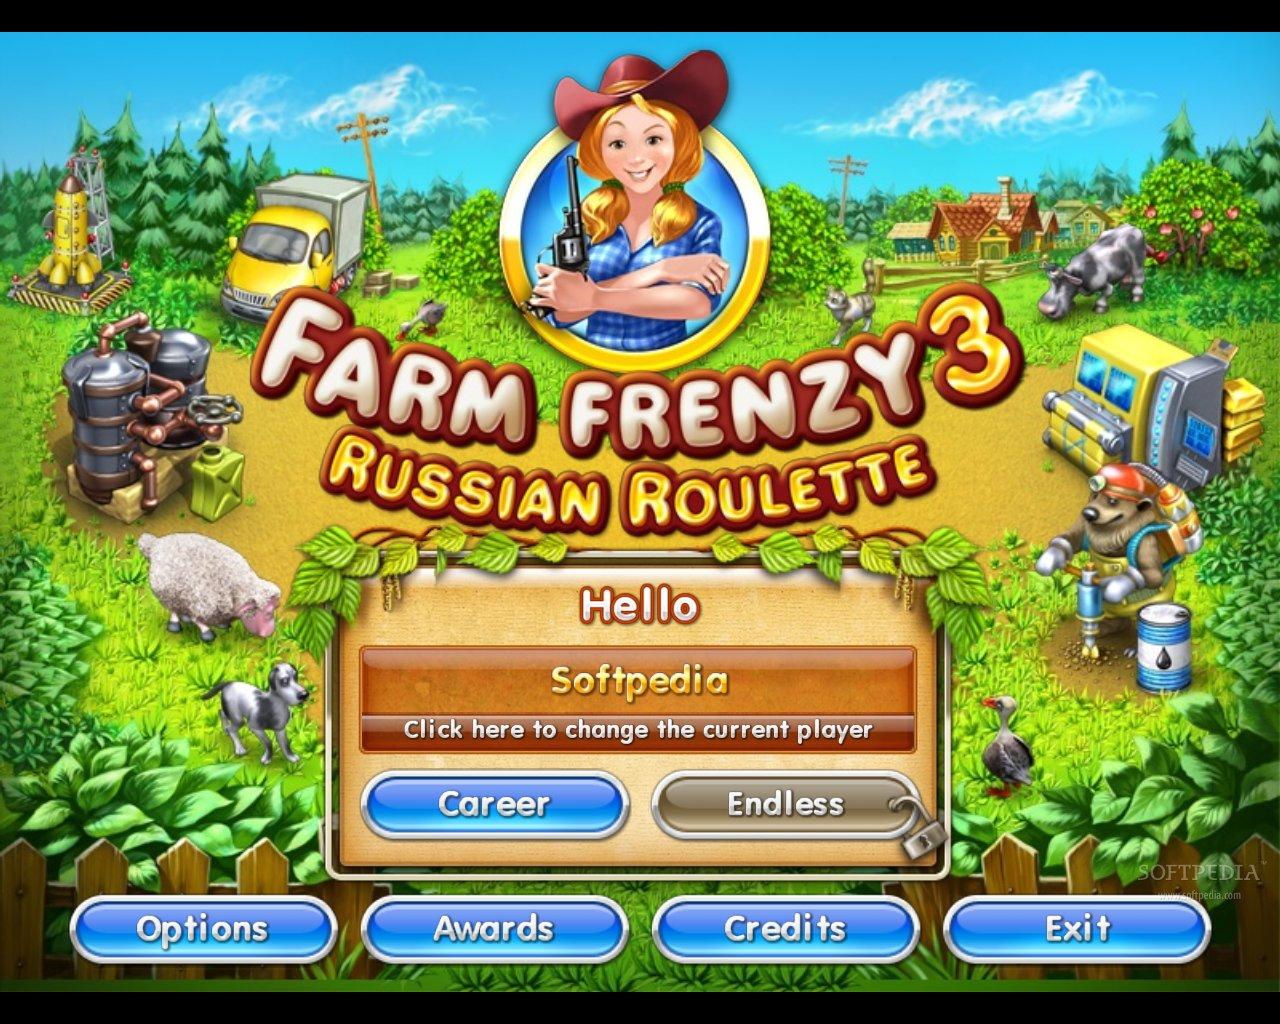 Download farm frenzy 3 russian roulette crack : Online